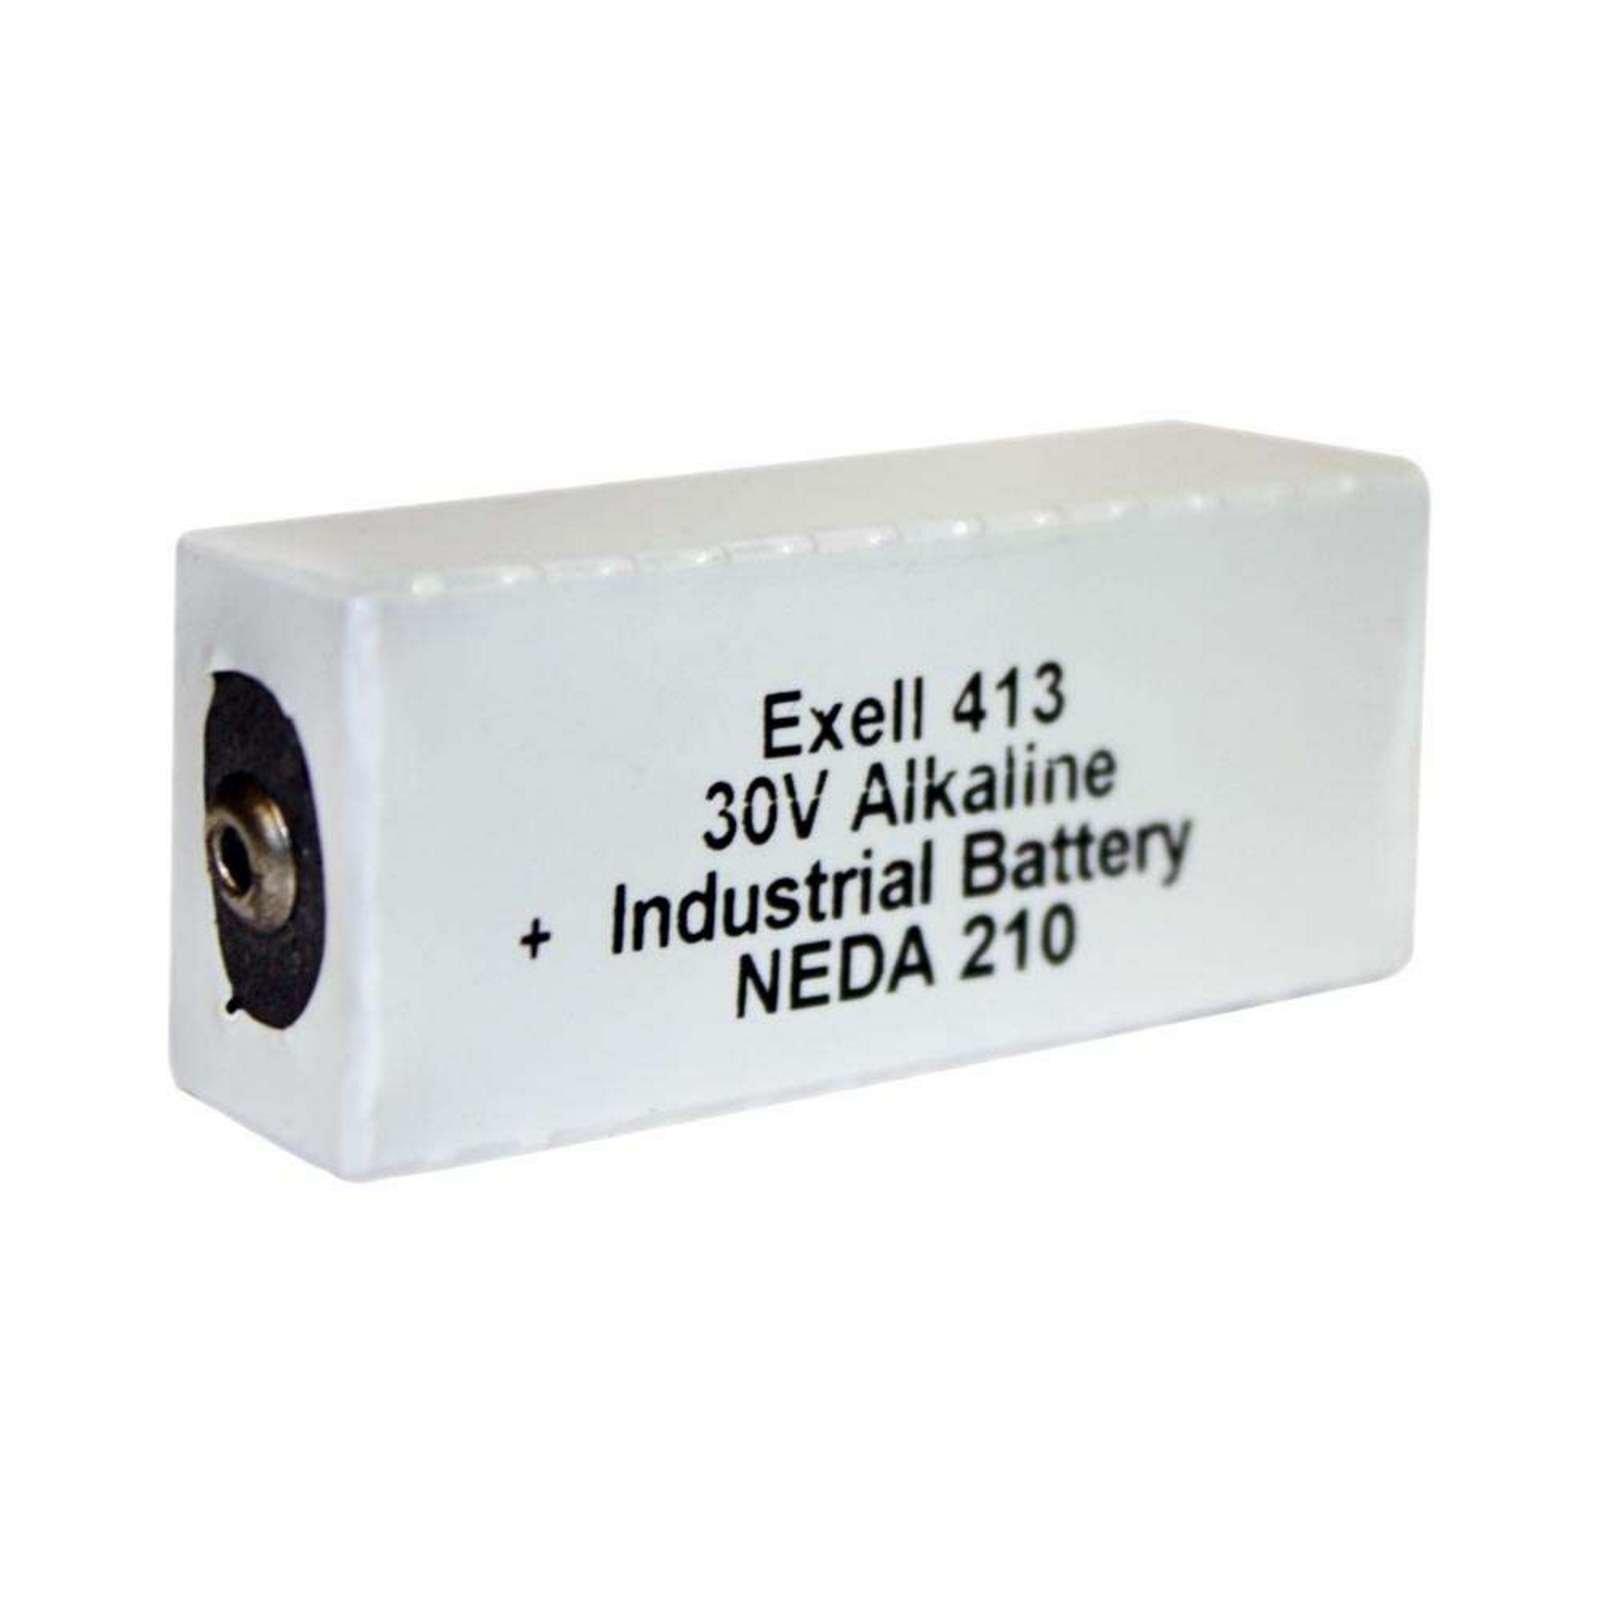 Exell 413 Industrial Battery Free Shipping Batterymart Com